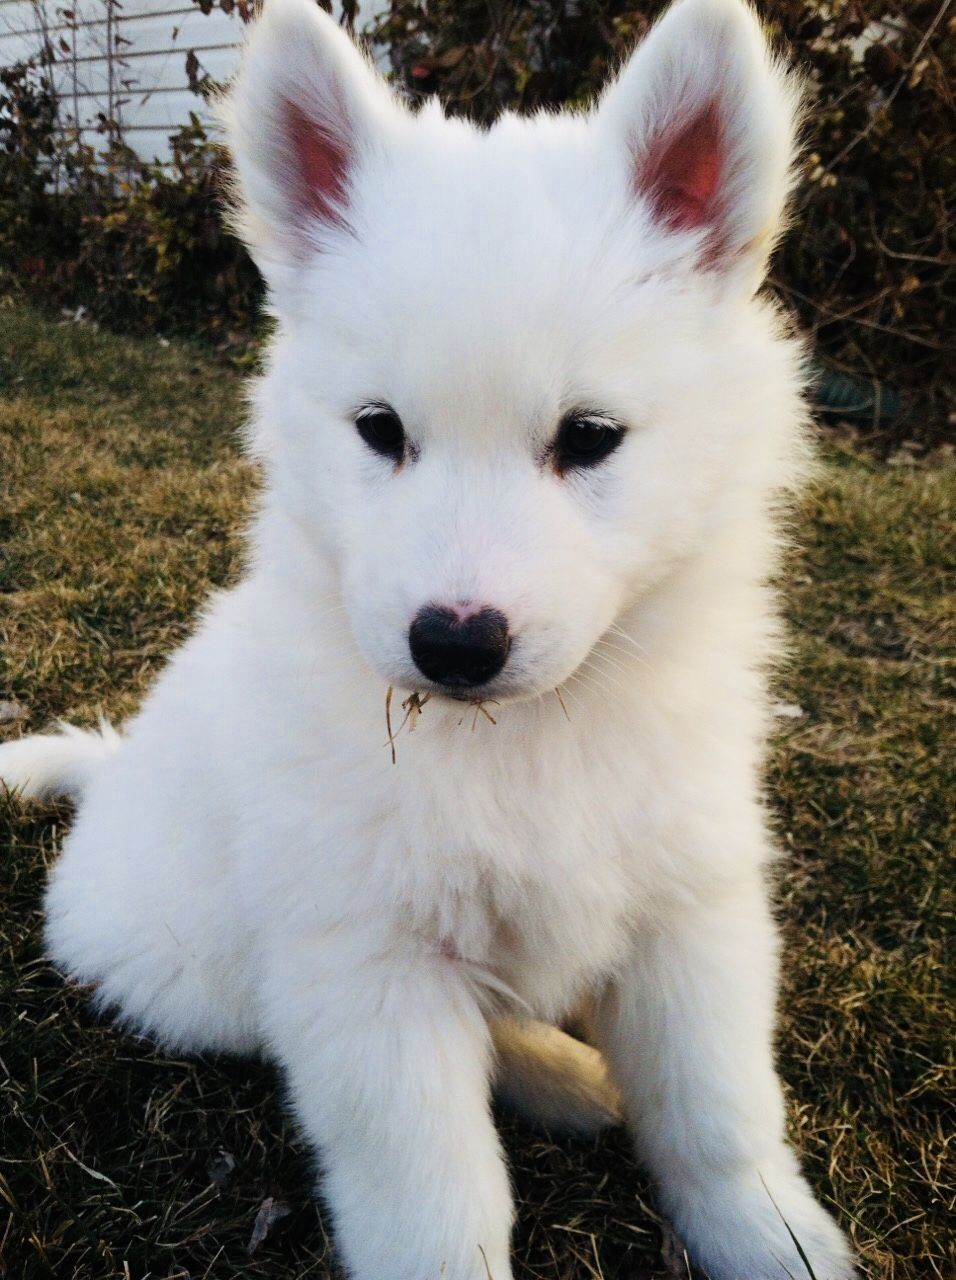 Pin by Antonija Bikic on Animals | White husky puppy, Cute ...